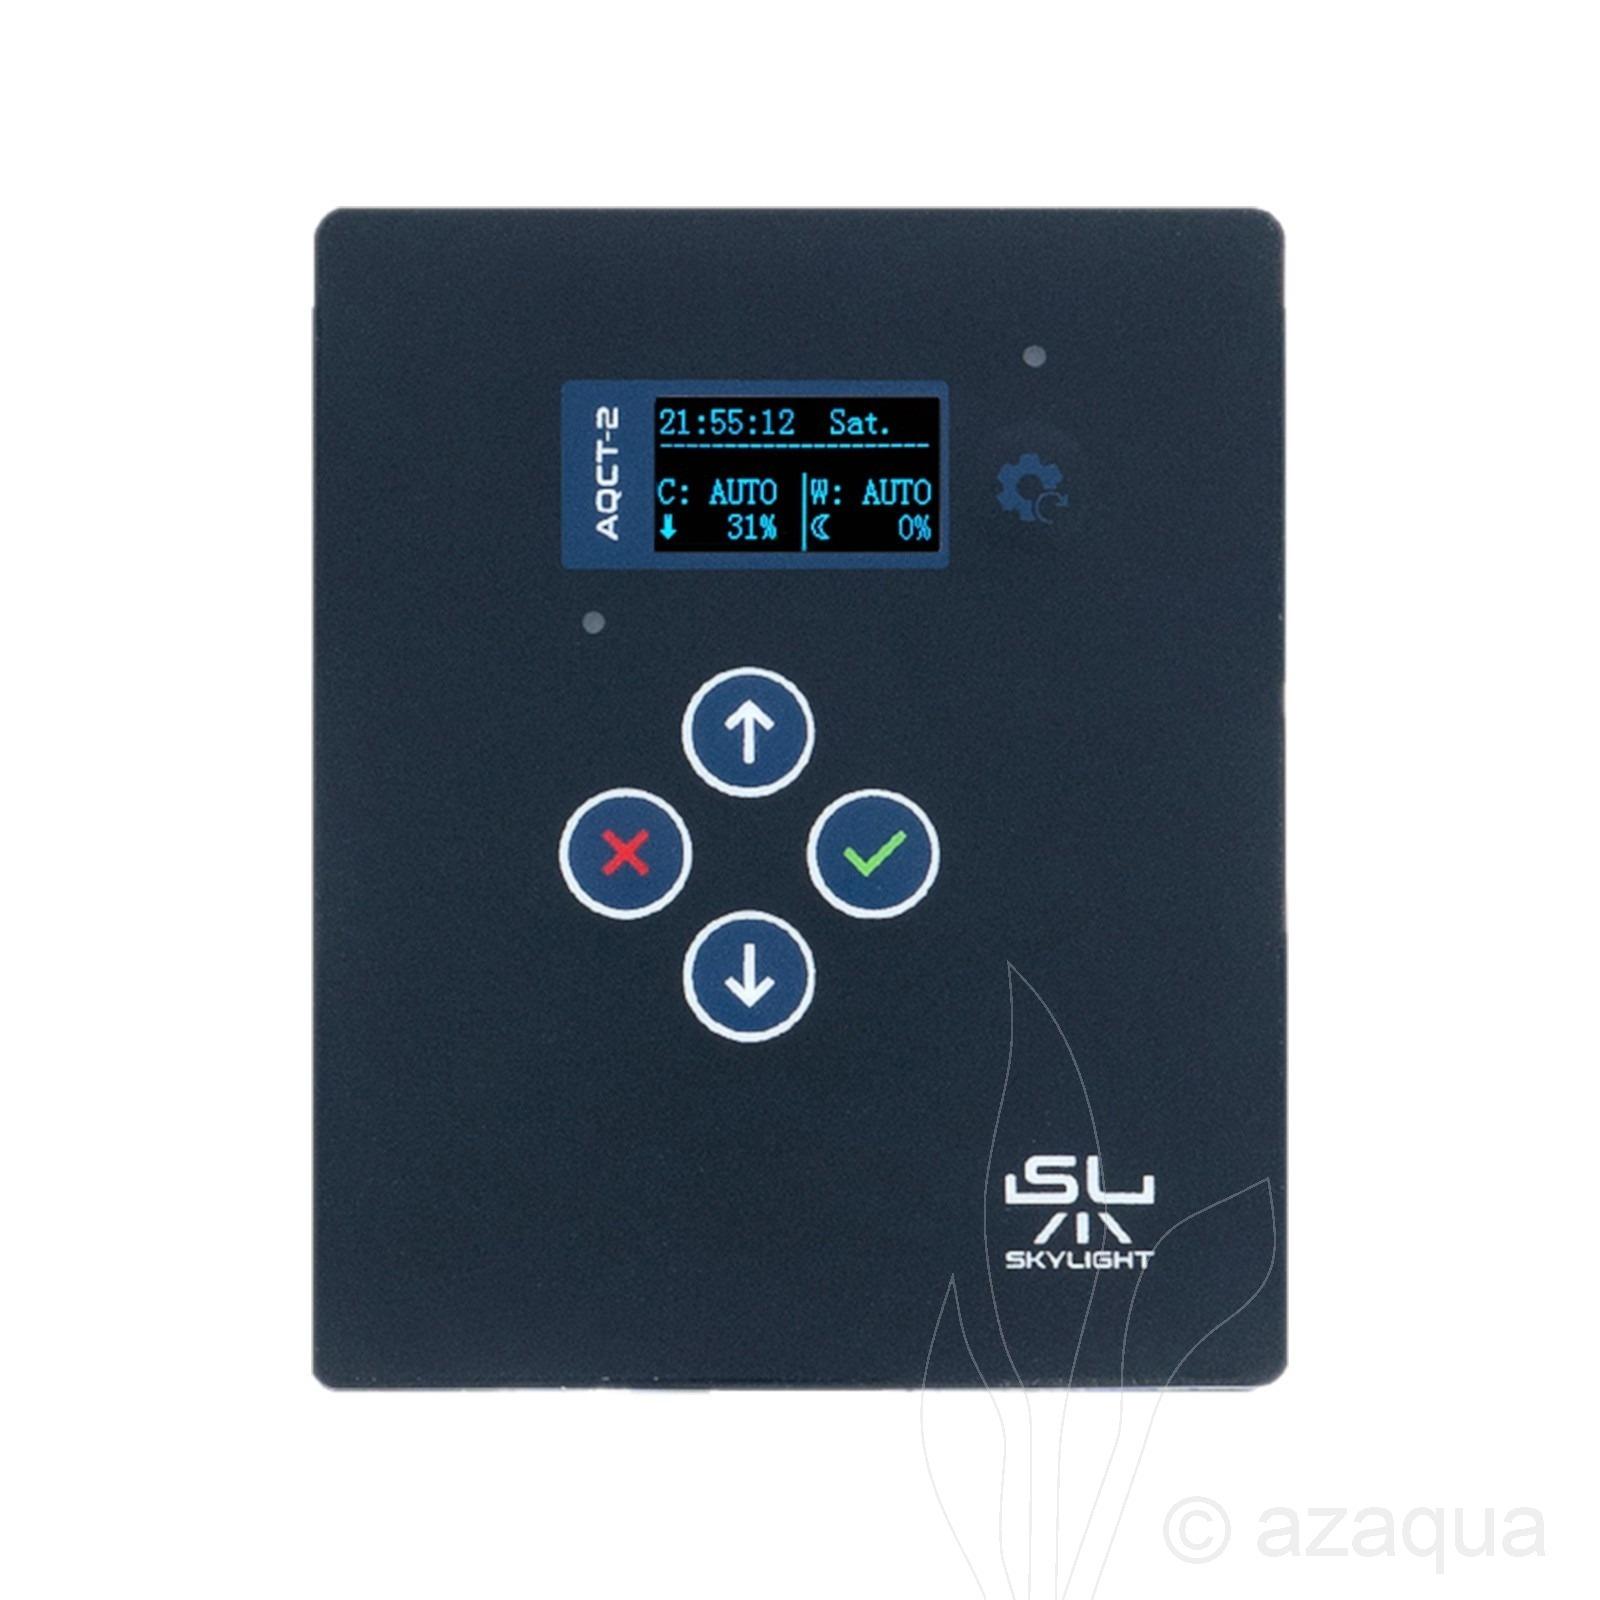 Skylight AQCT-2 TIMER controller